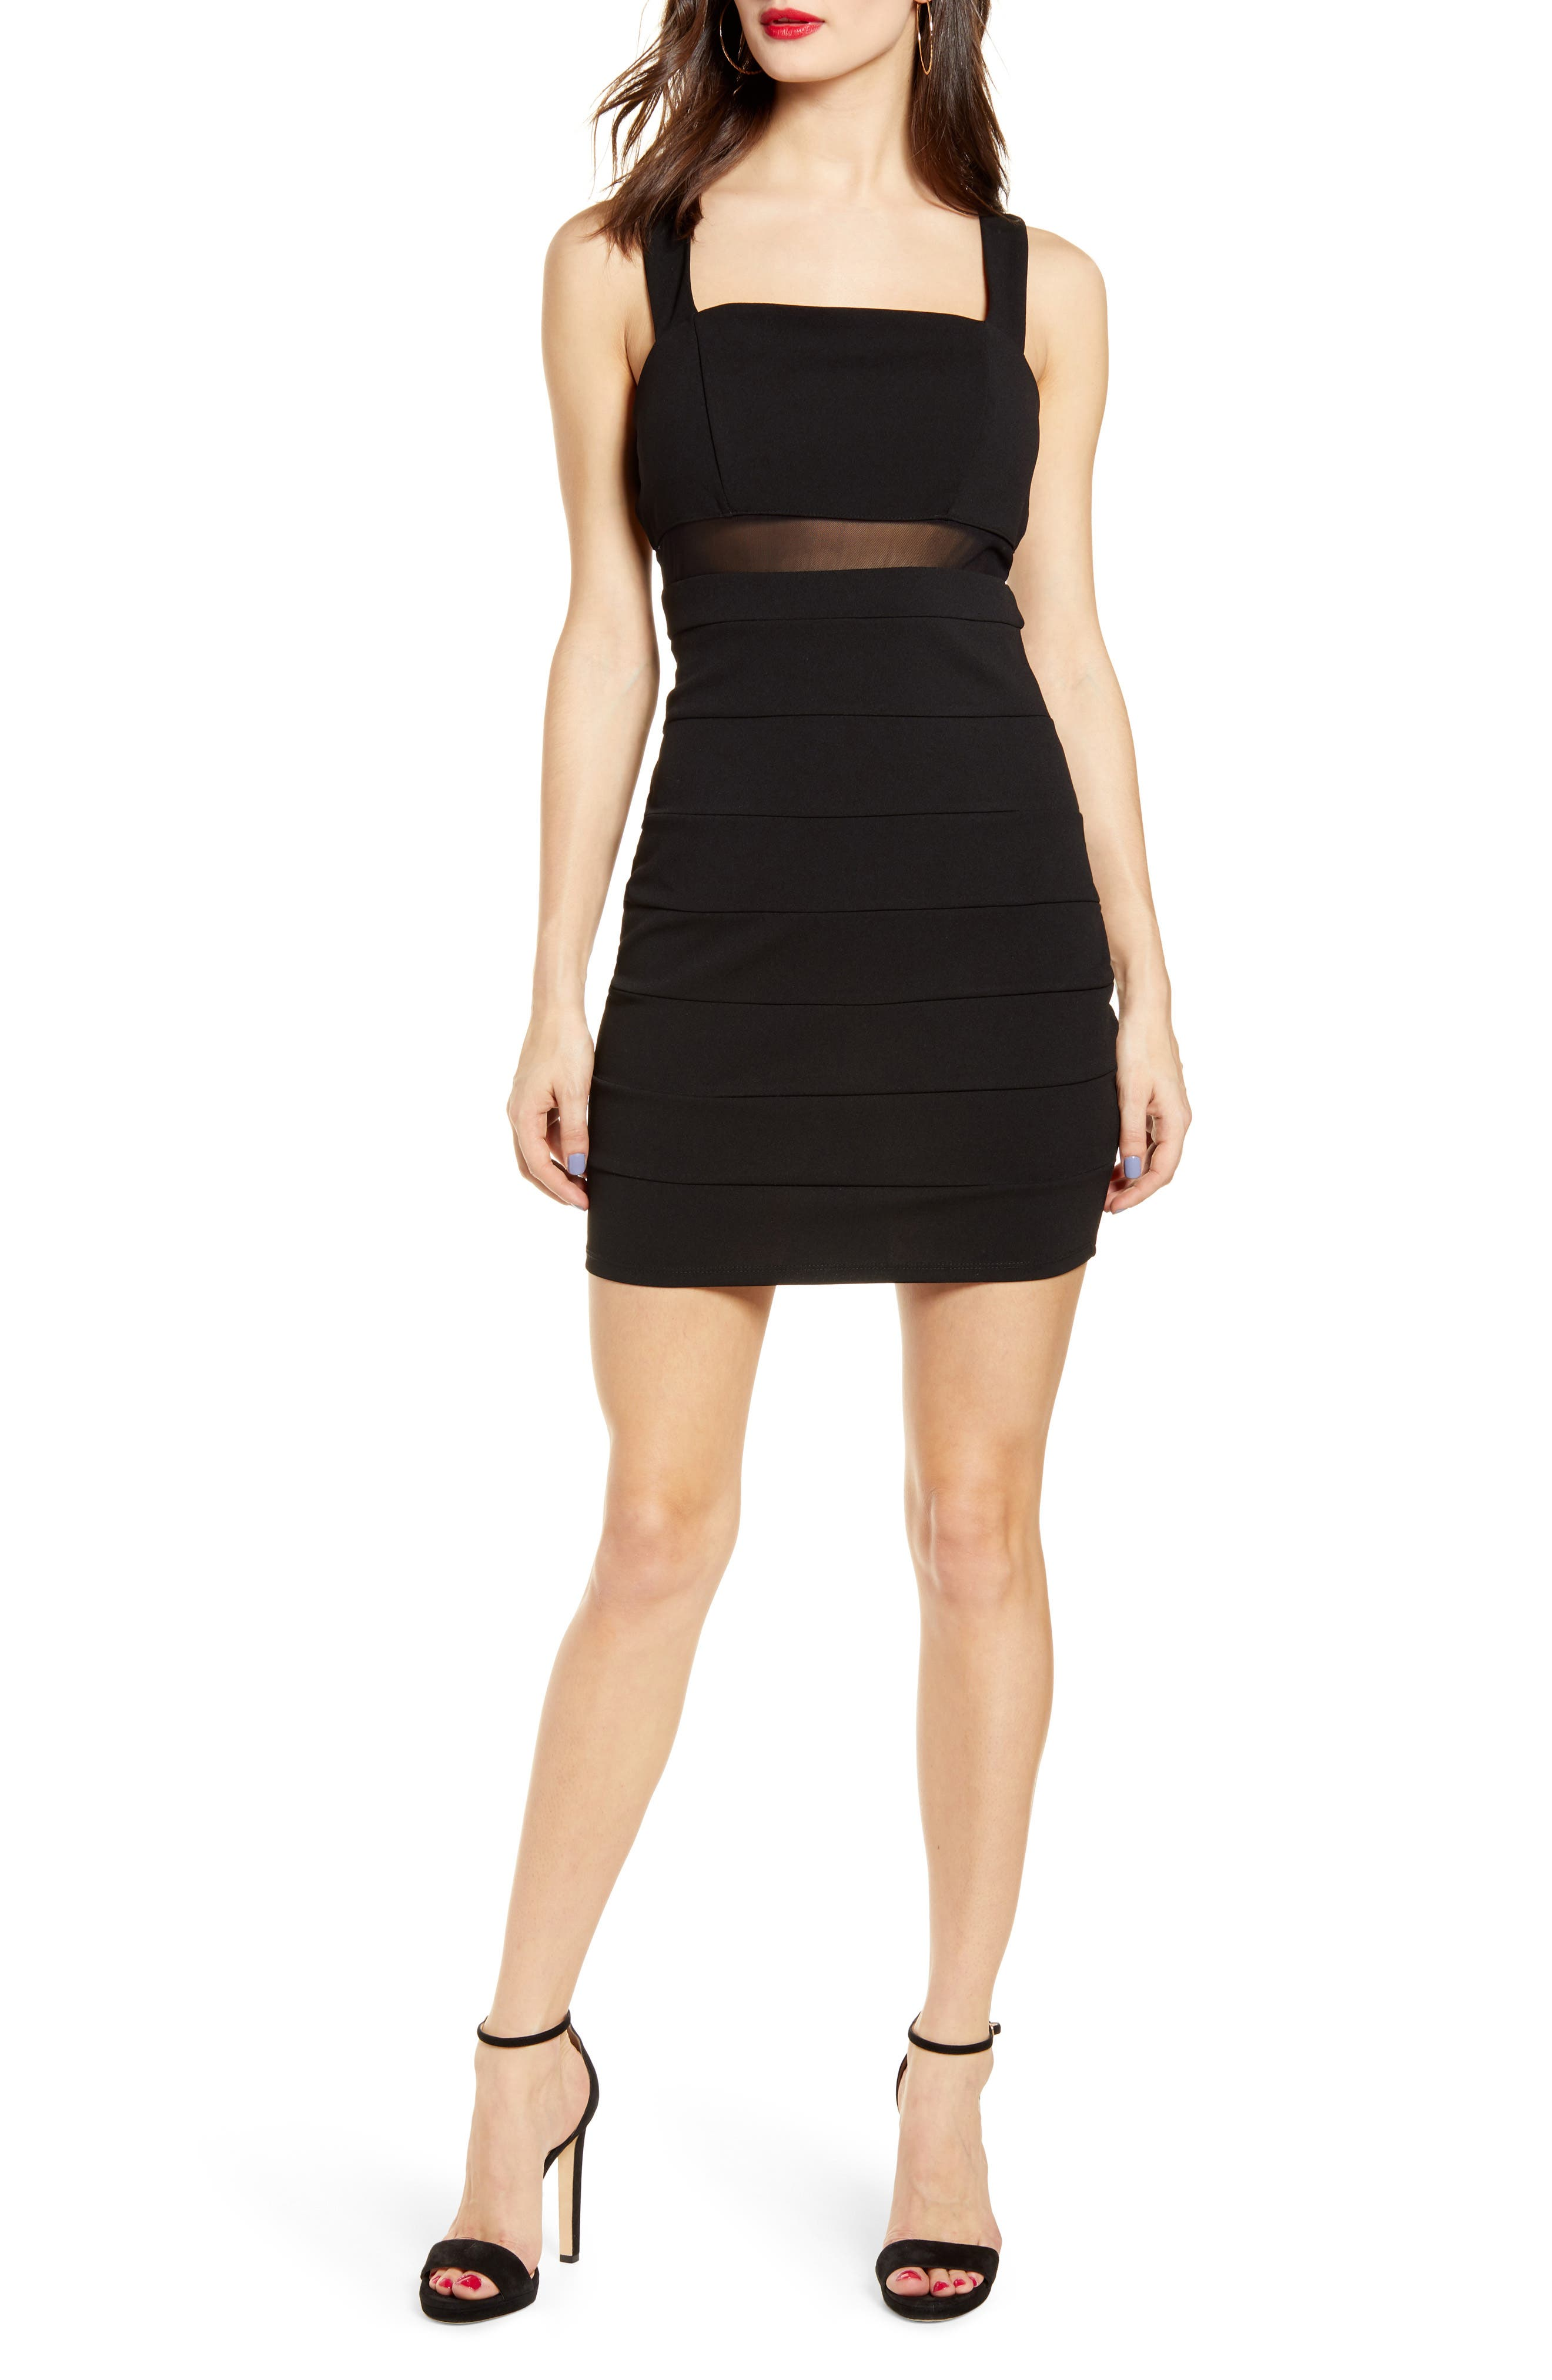 Love, Nickie Lew Illusion Panel Body-Con Dress, Black